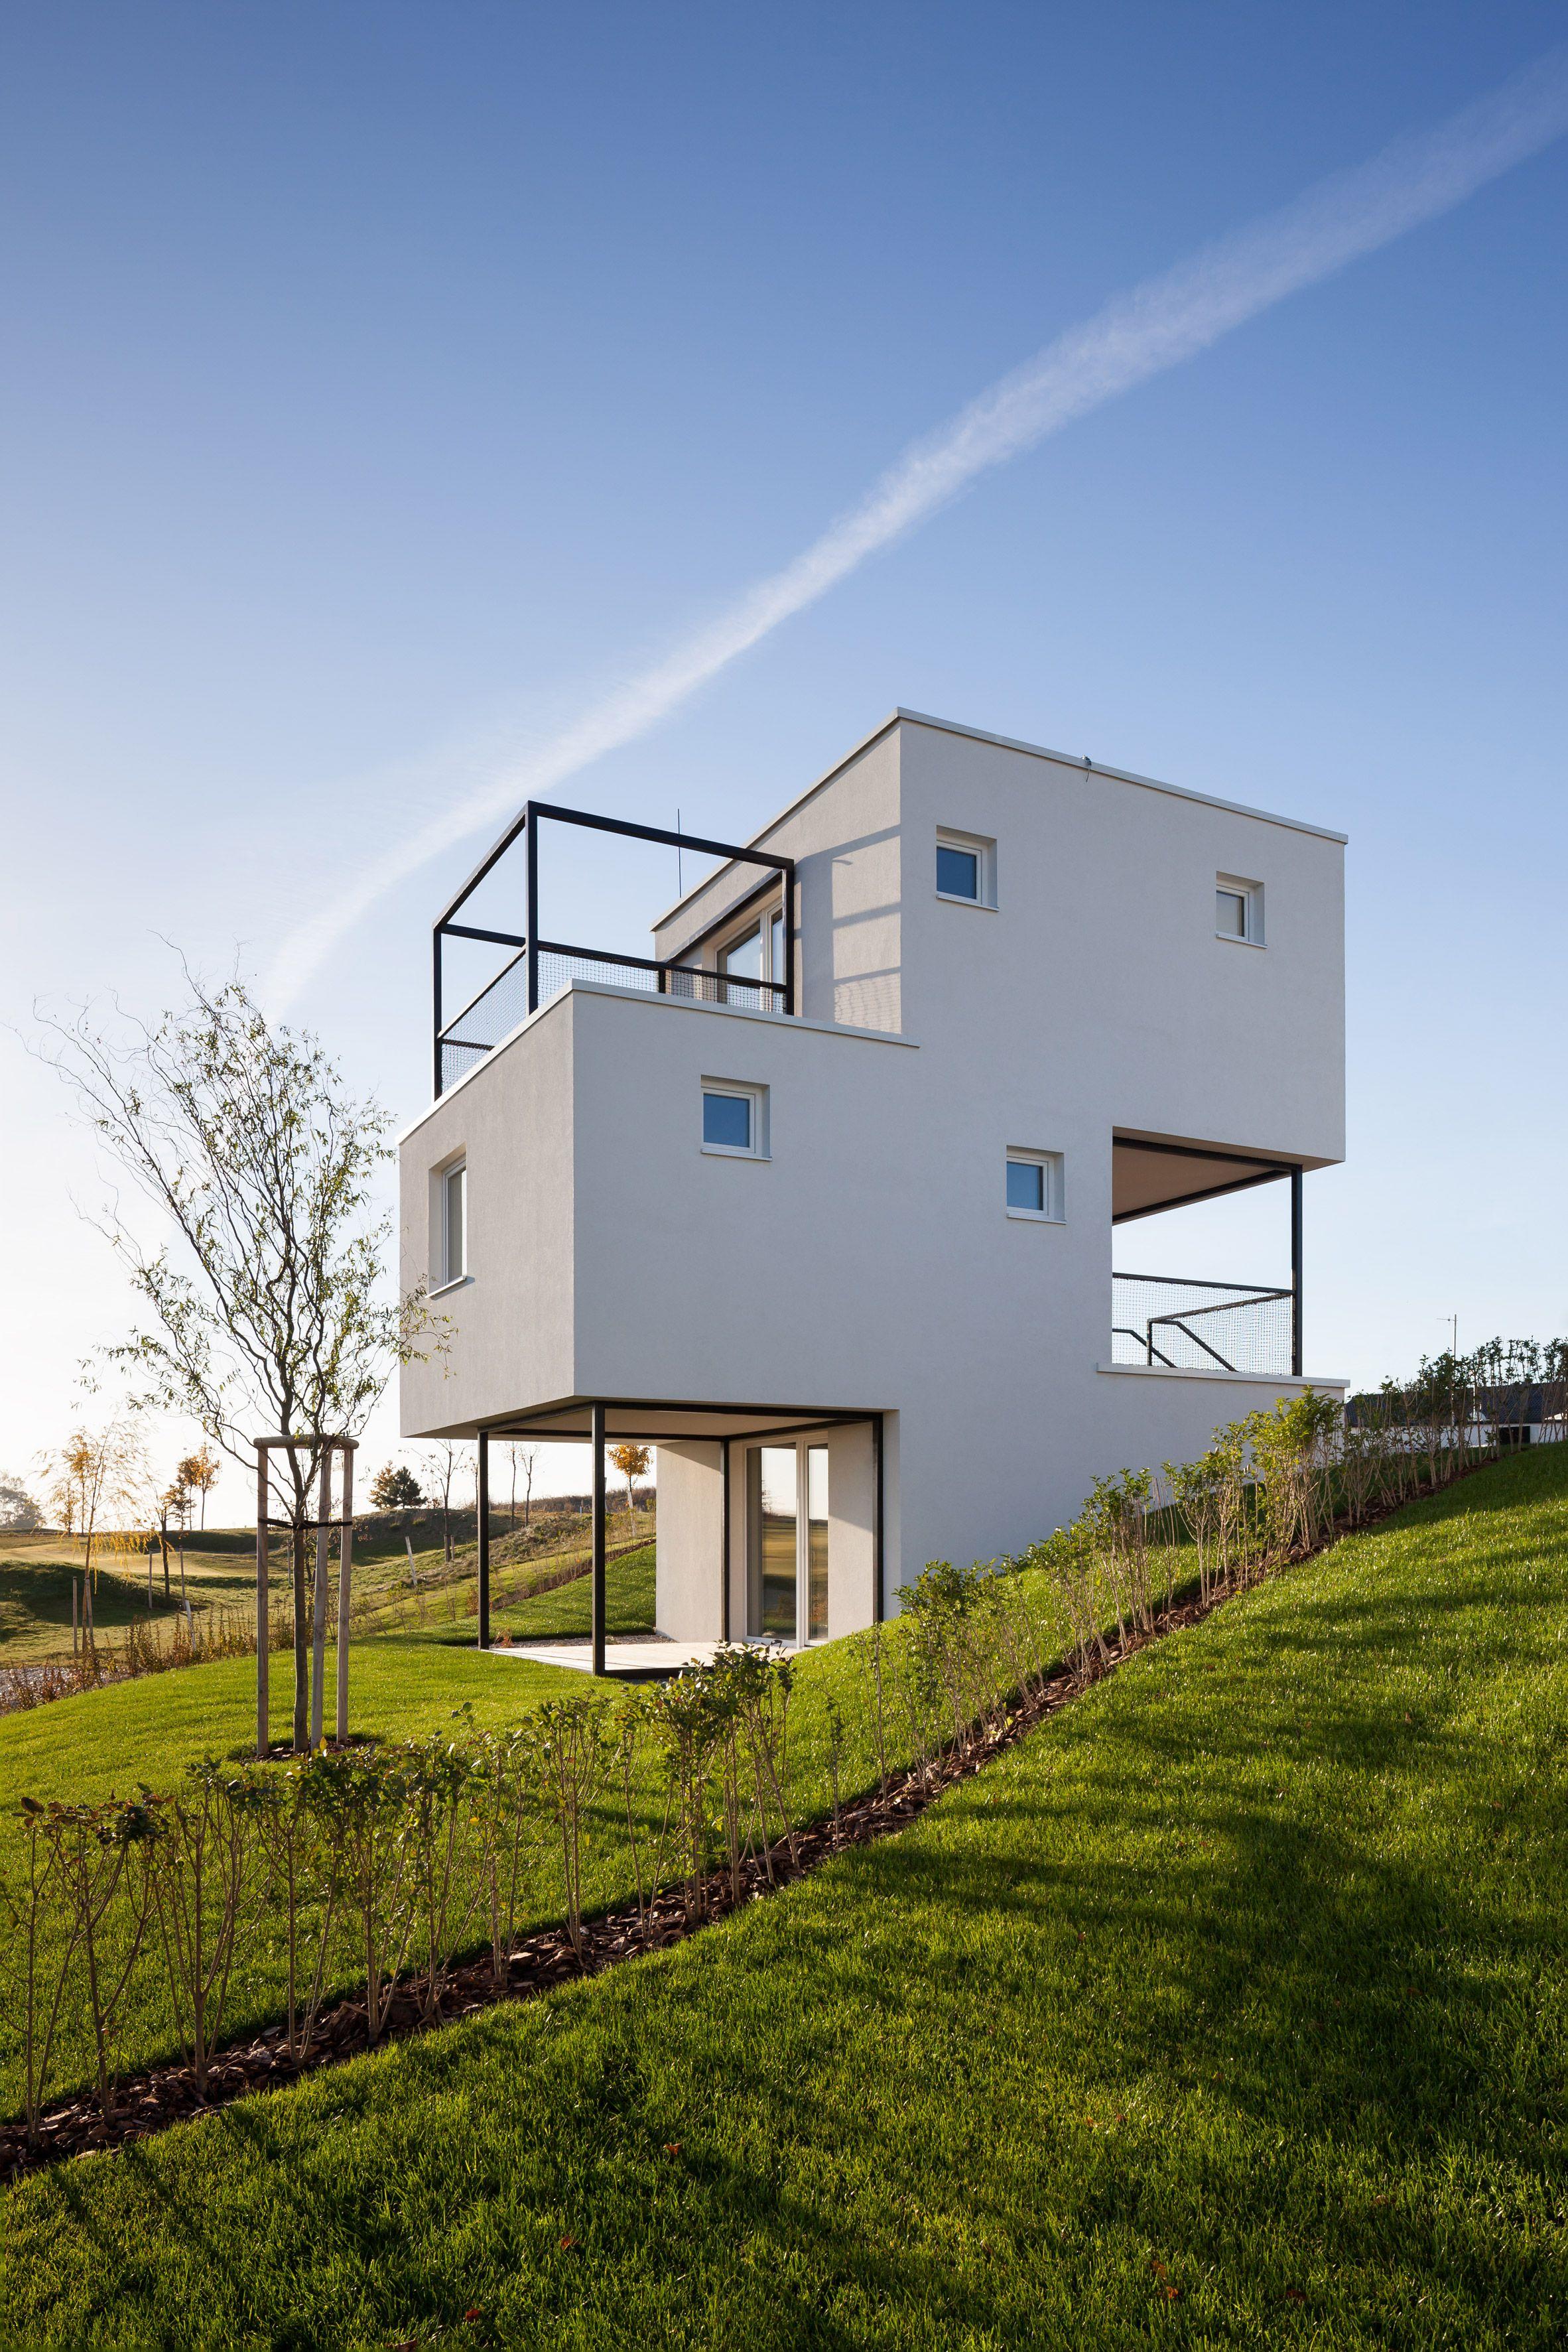 3x3 Houses by Endorfine | Residential Arch | Pinterest | Architektur ...